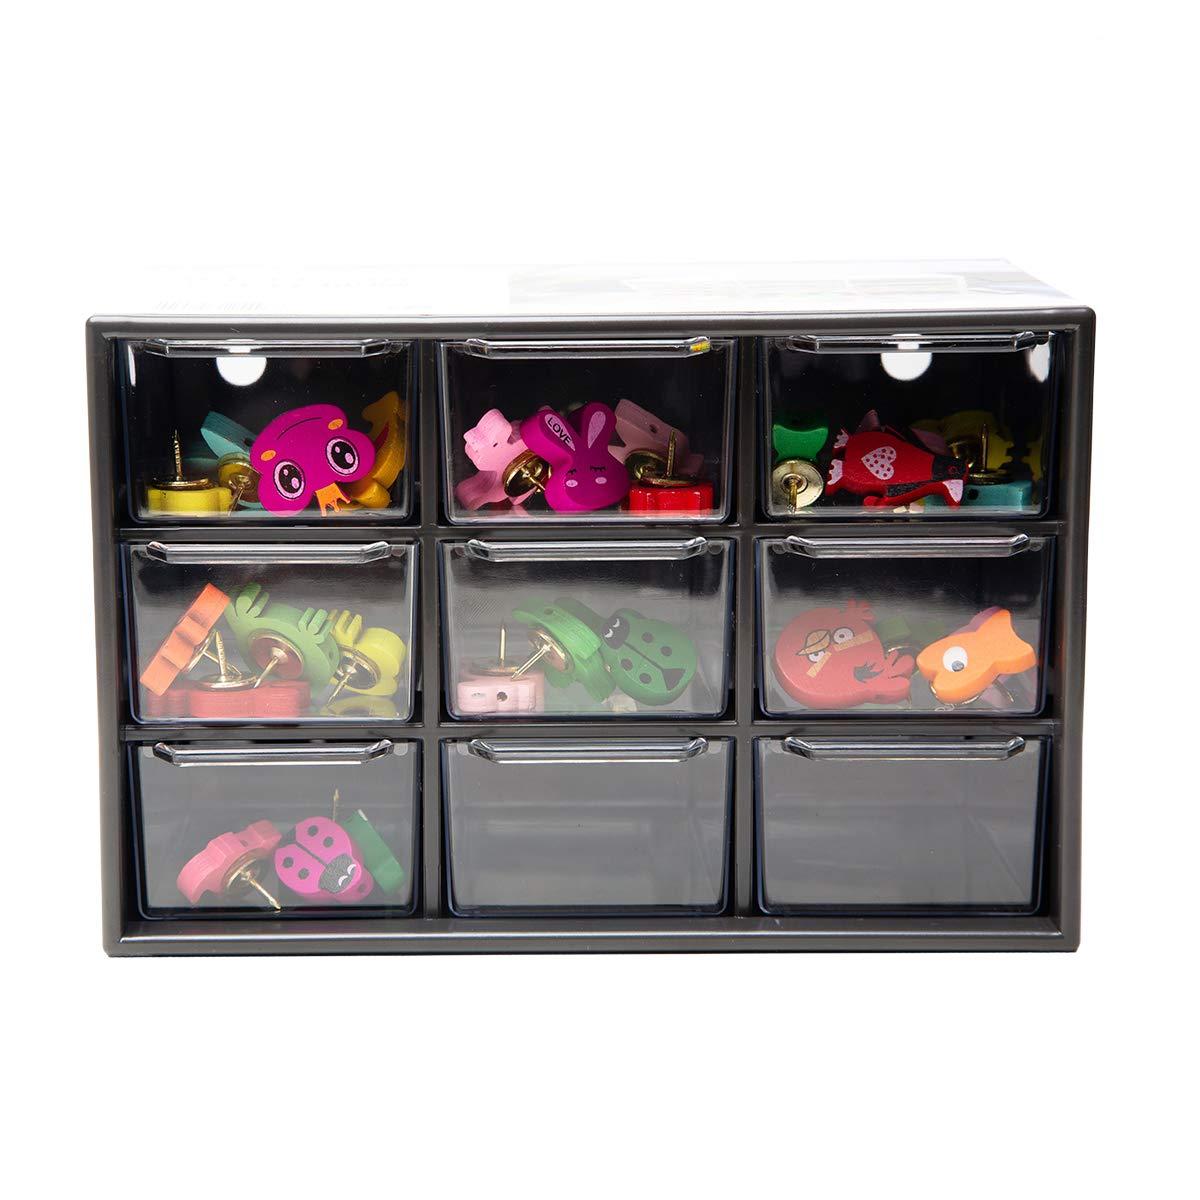 Chris-Wang Removeable Mini Acrylic 9 Drawer Desktop Storage Organizer/Collection Caddy/Small Belongings Holder/Art Craft Sorter, 18*10*12cm, Black